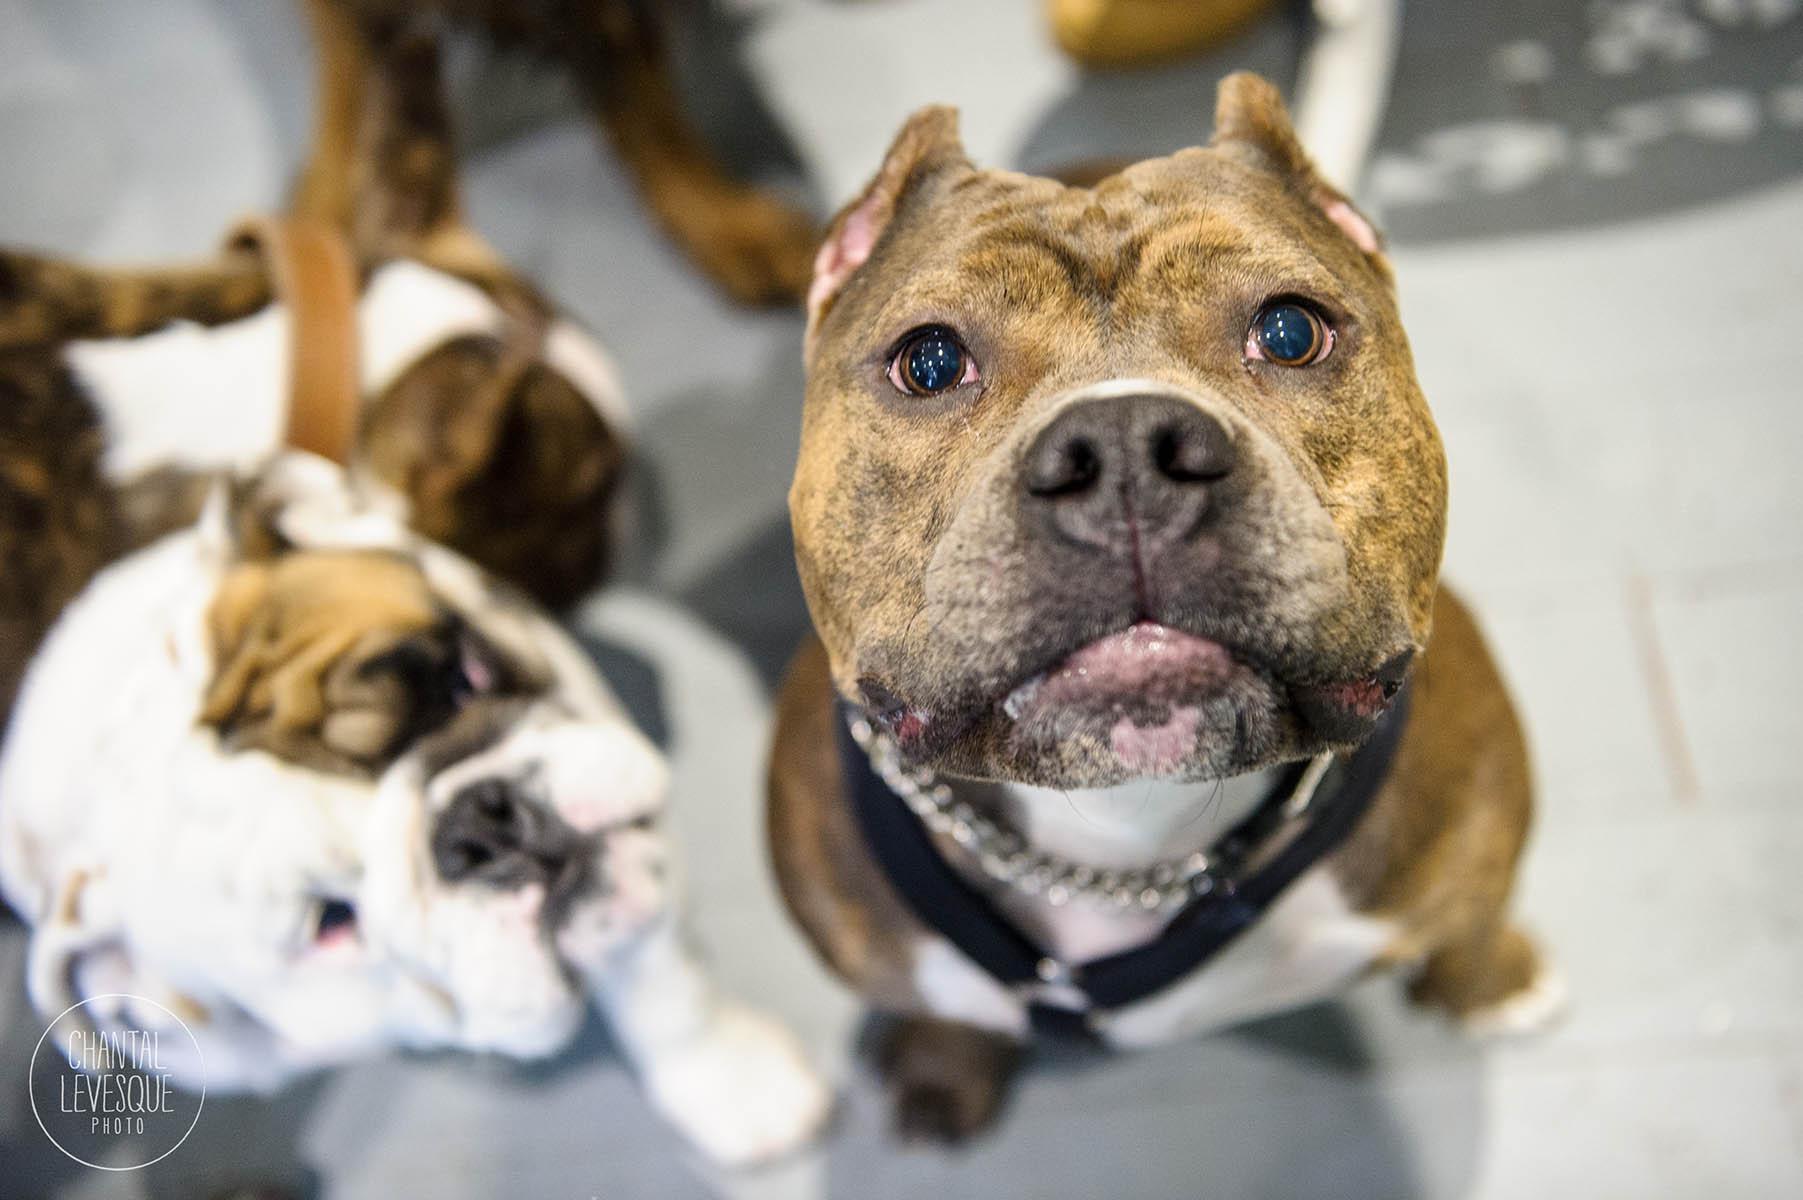 Doggy-casting-pitbulls-4638.jpg